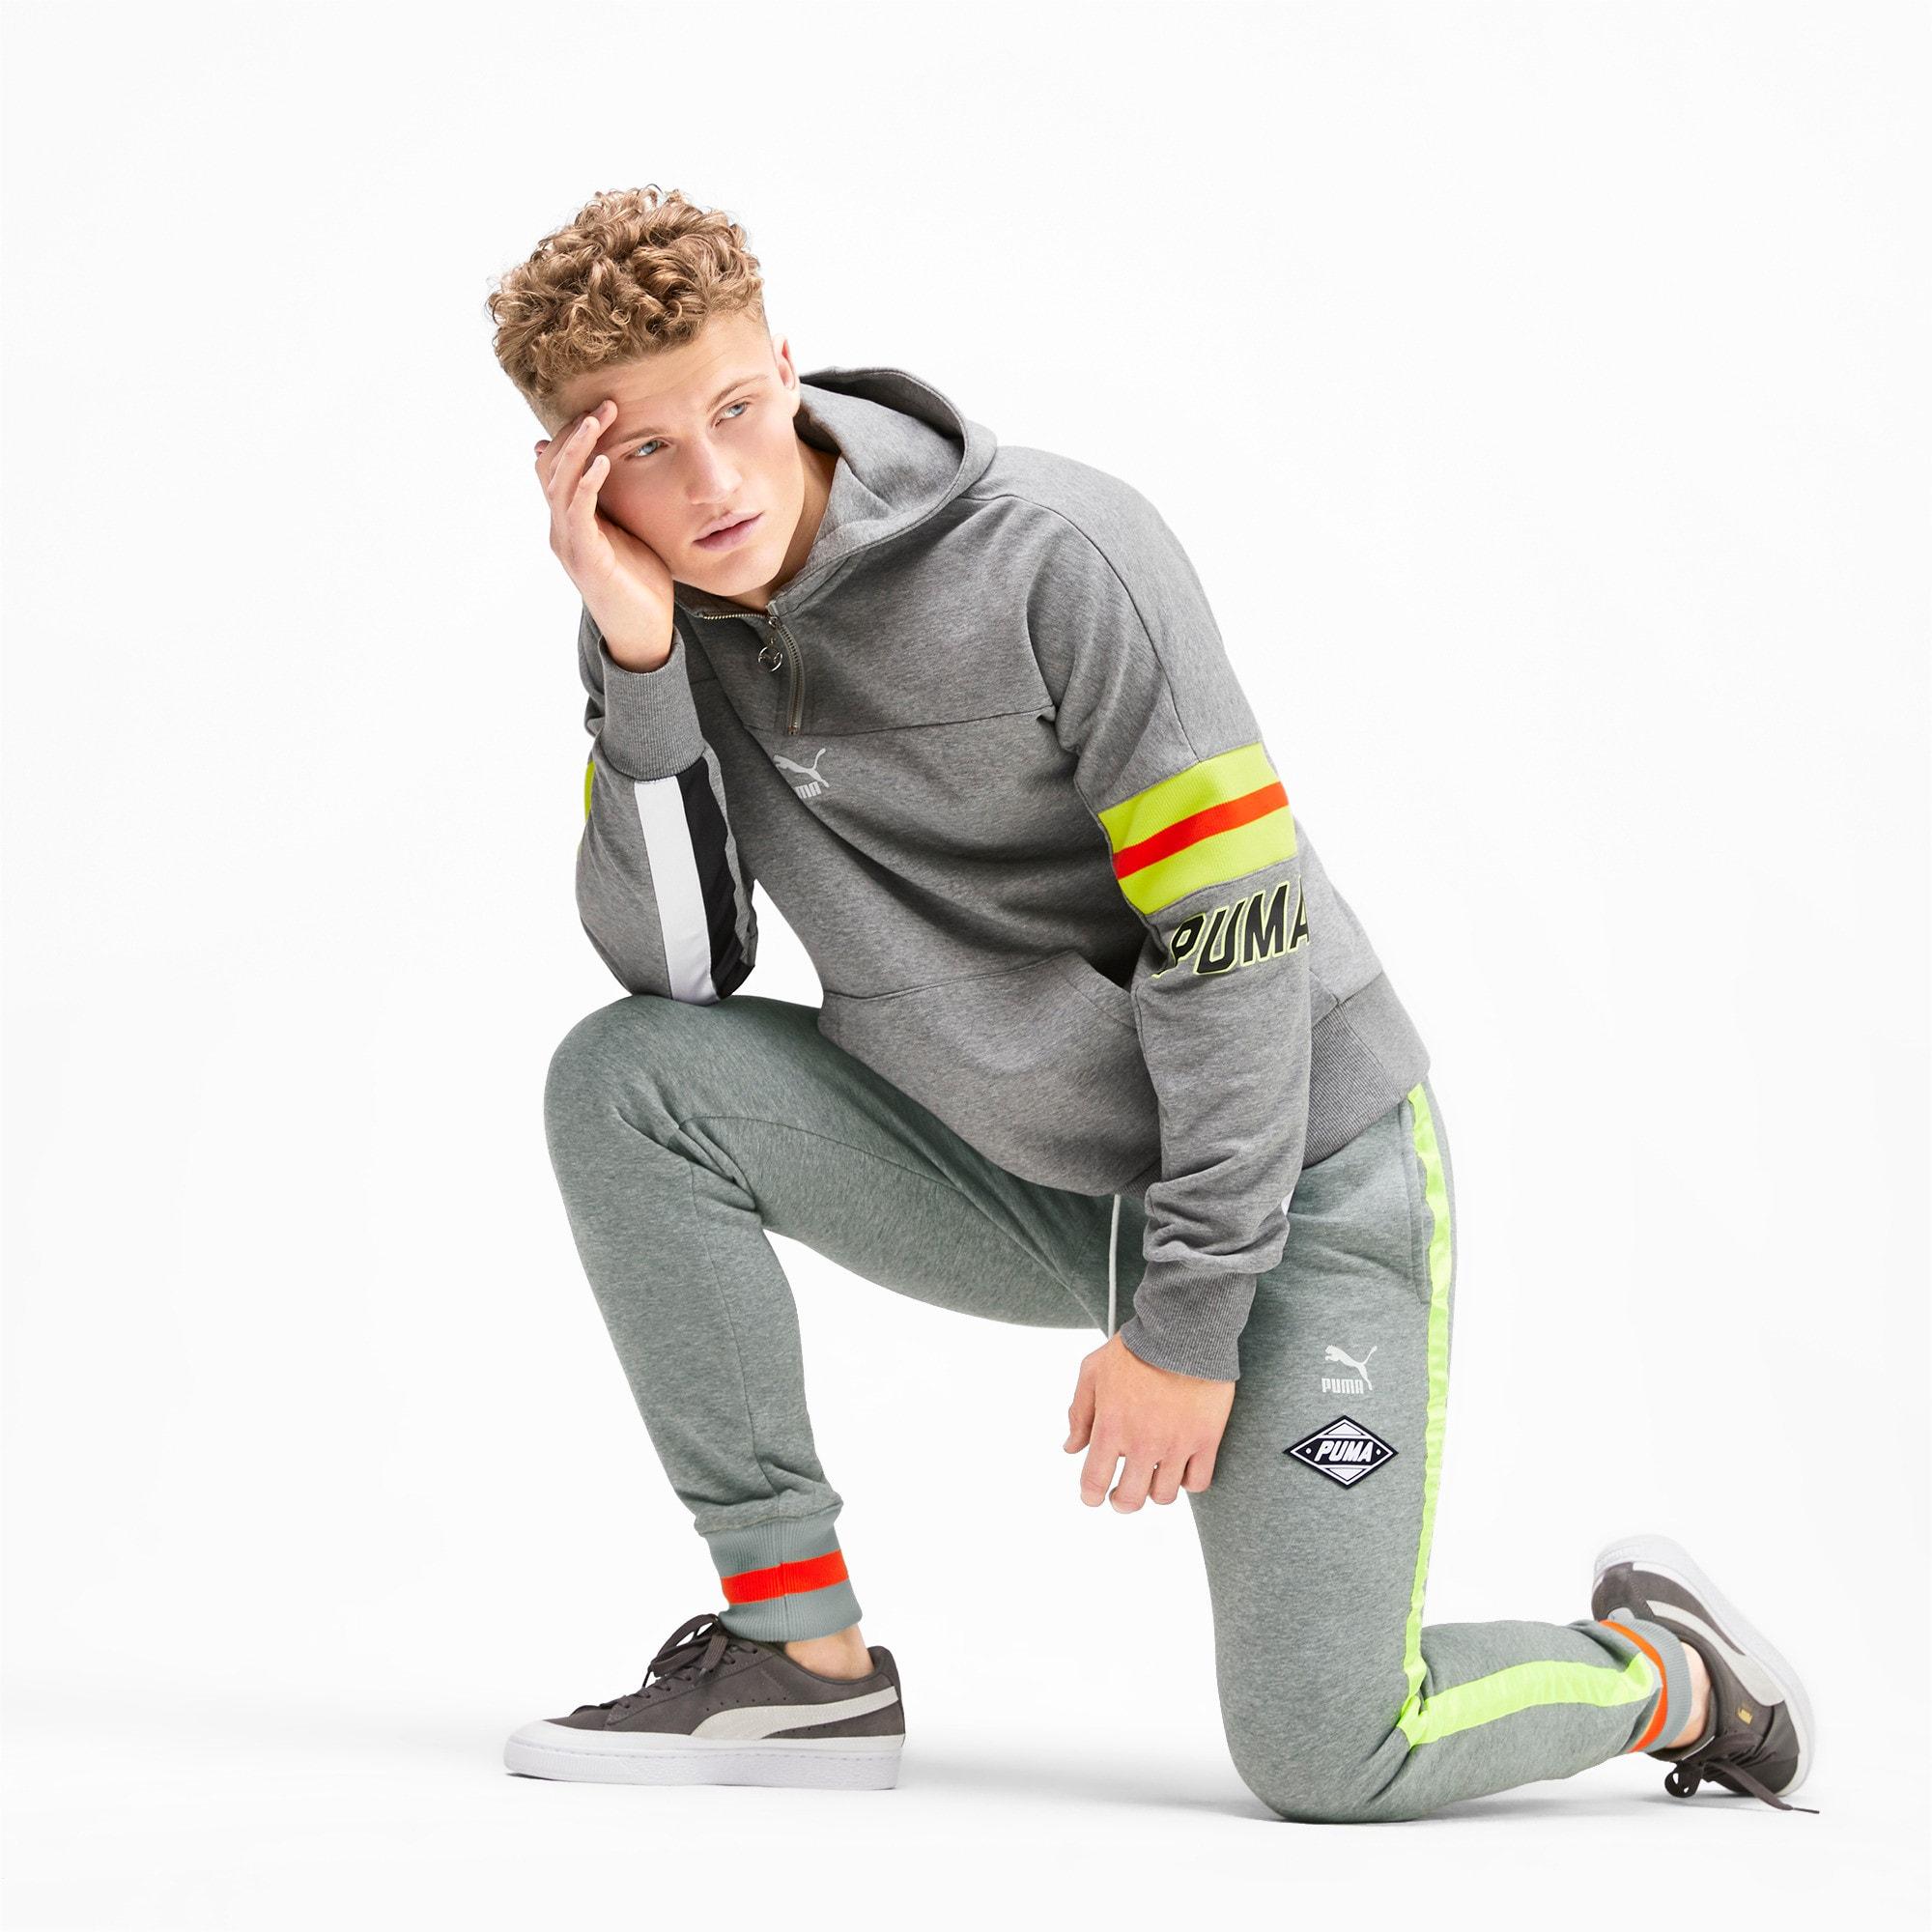 Thumbnail 4 of luXTG Men's Cuffed Sweatpants, Medium Gray Heather, medium